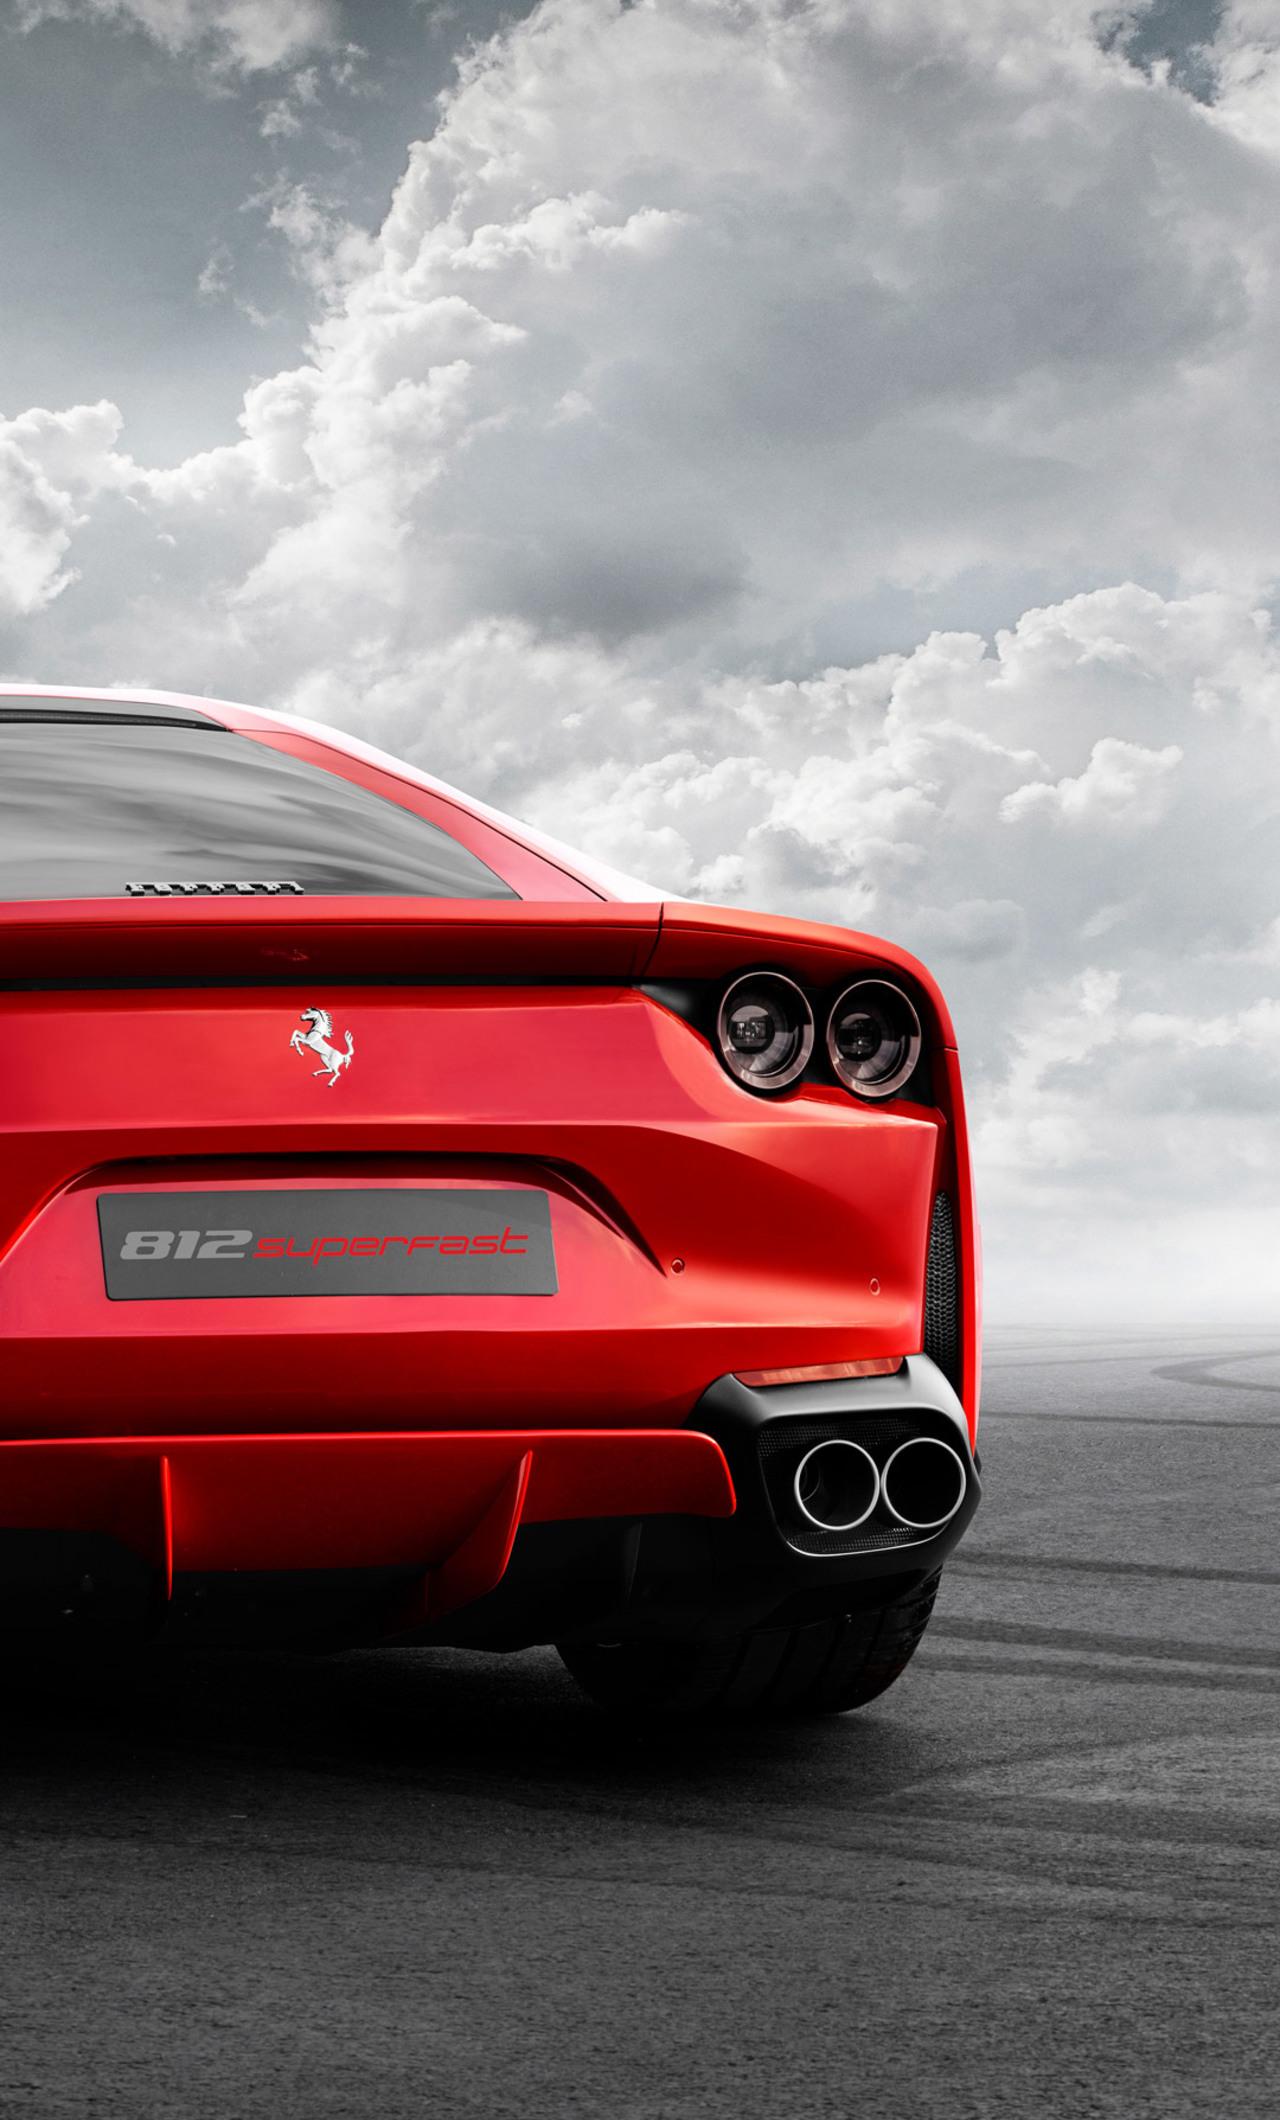 Download Wallpaper Ferrari 812 Superfast Preço 2099362